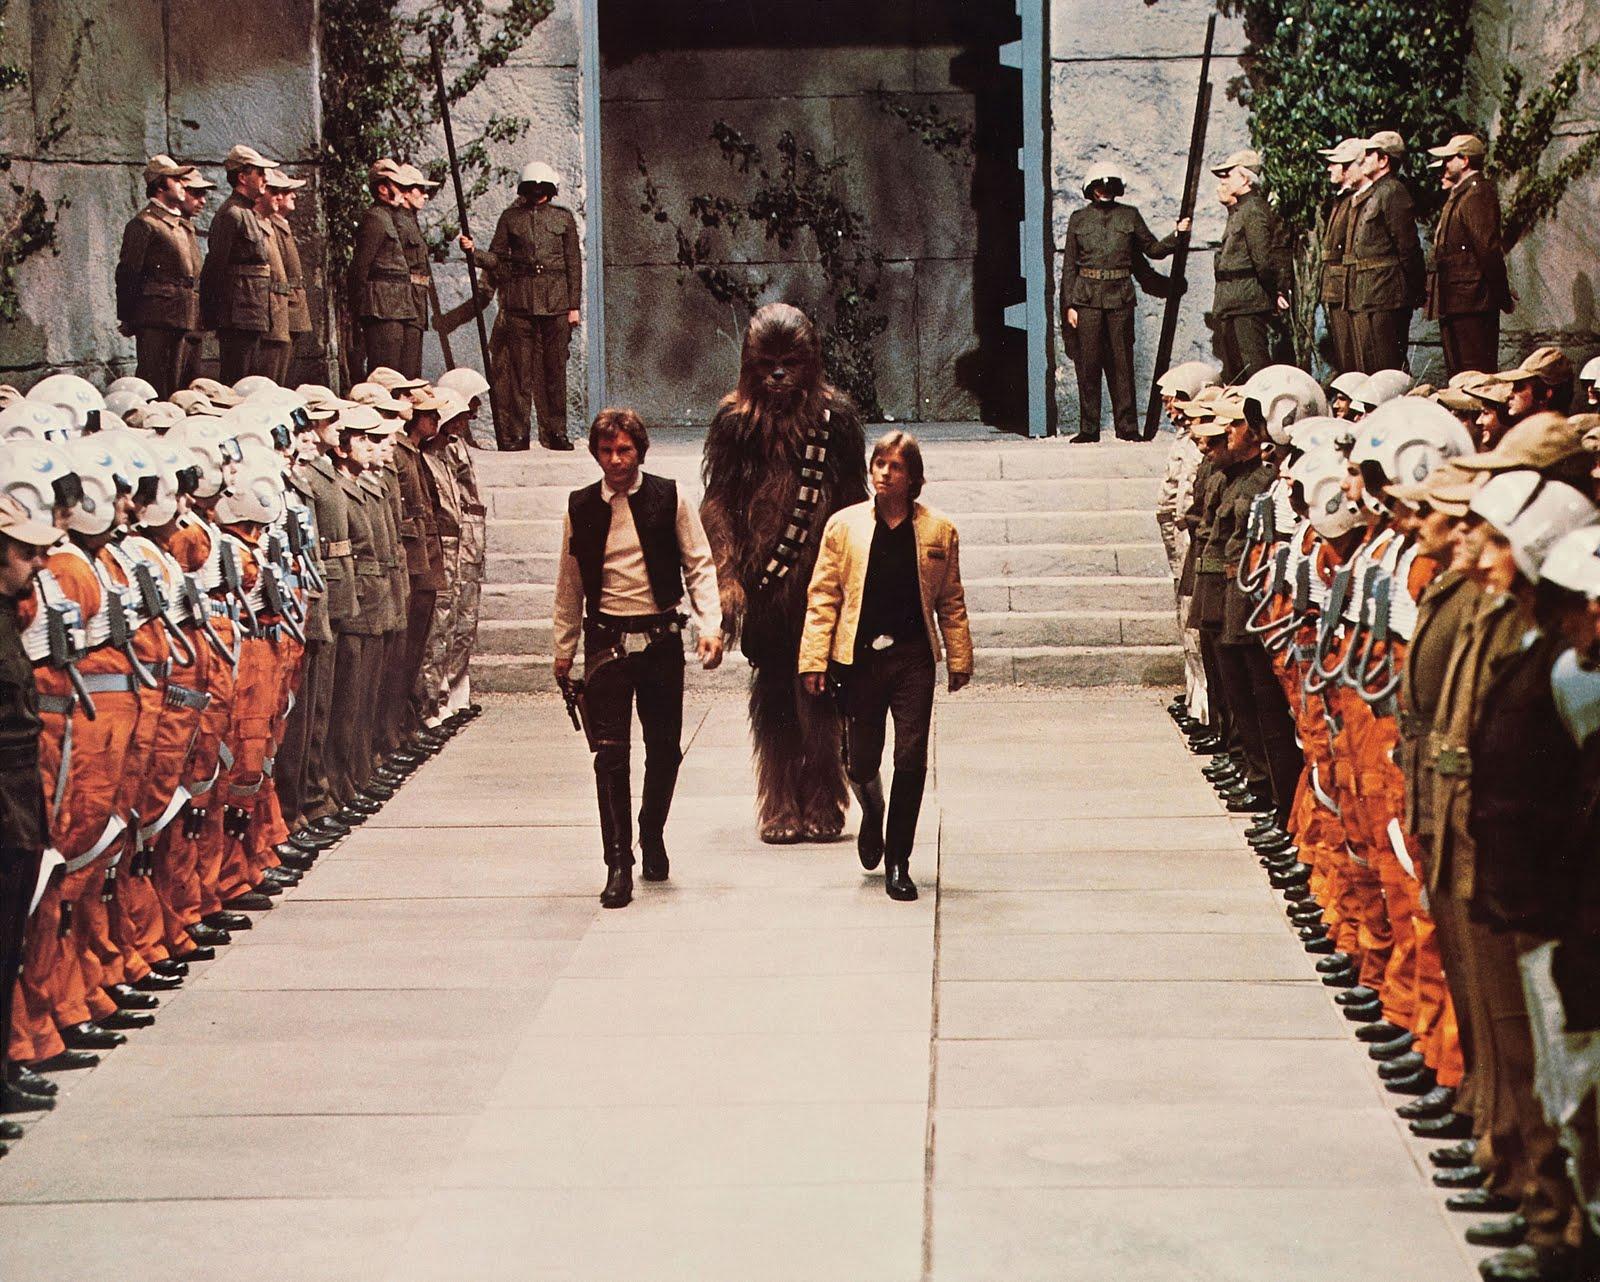 Star wars: episode iv - a new hope photobusta lobby cards